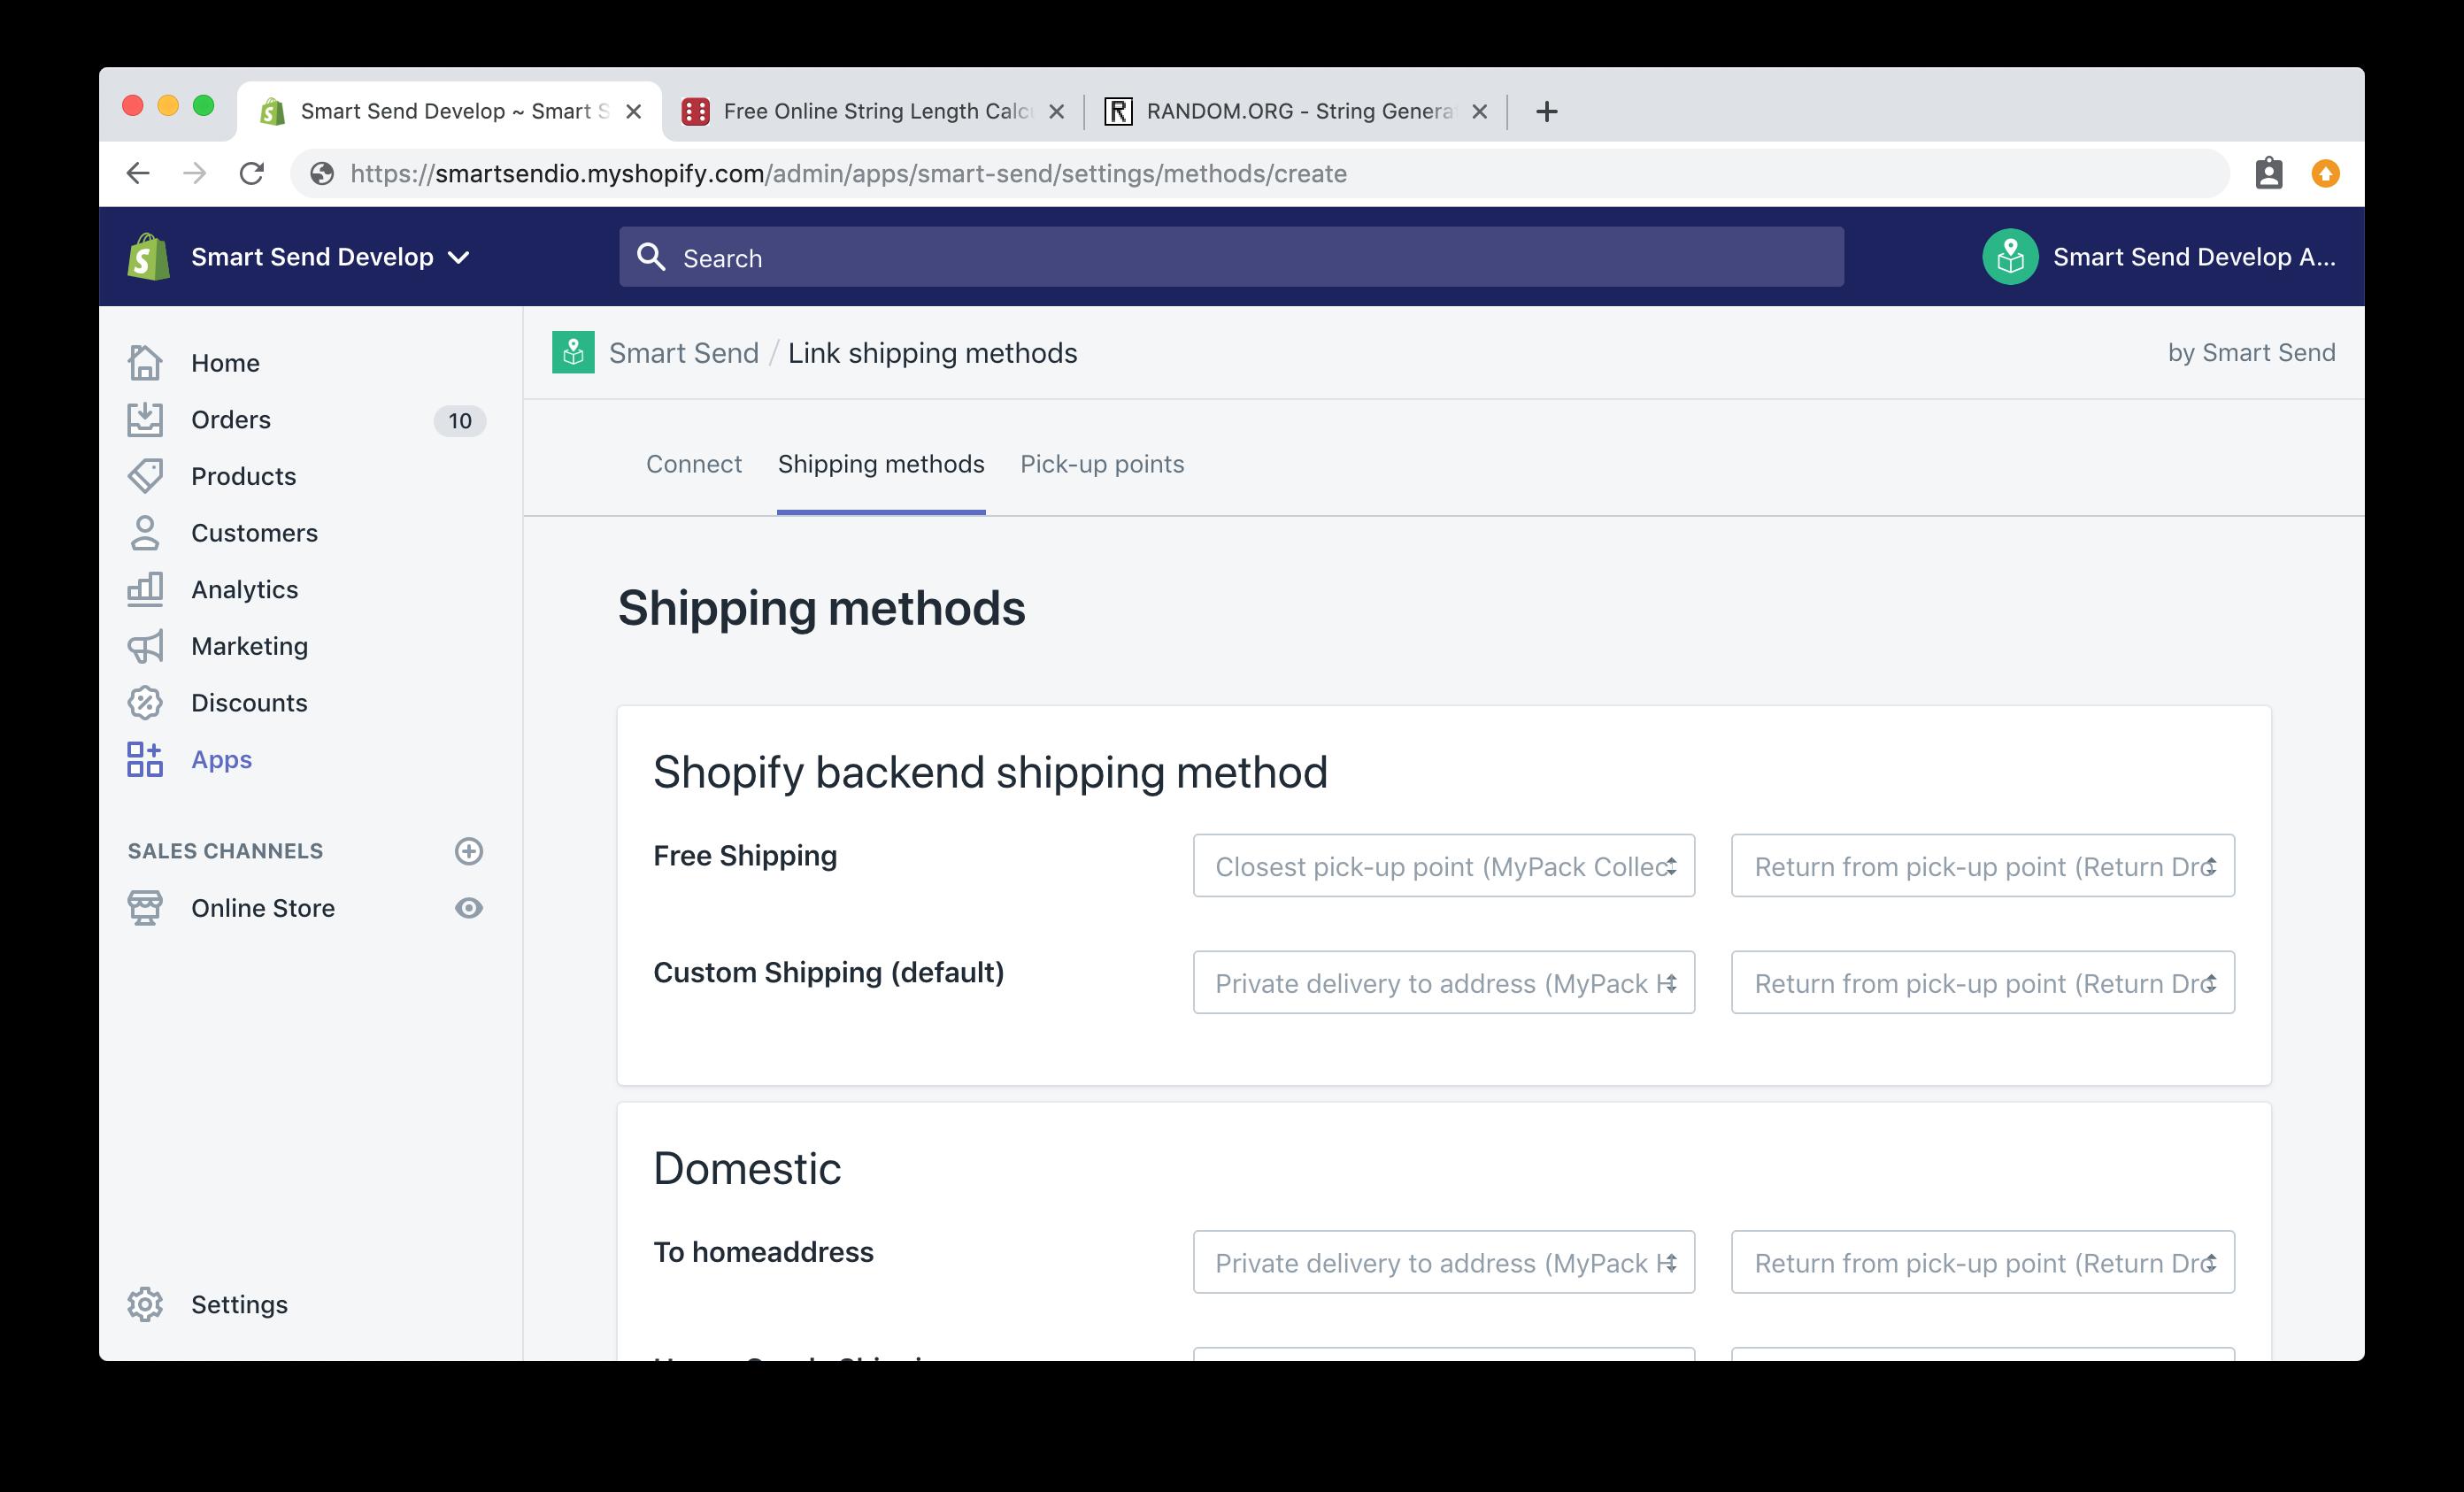 Add shipping methods using Smart Send